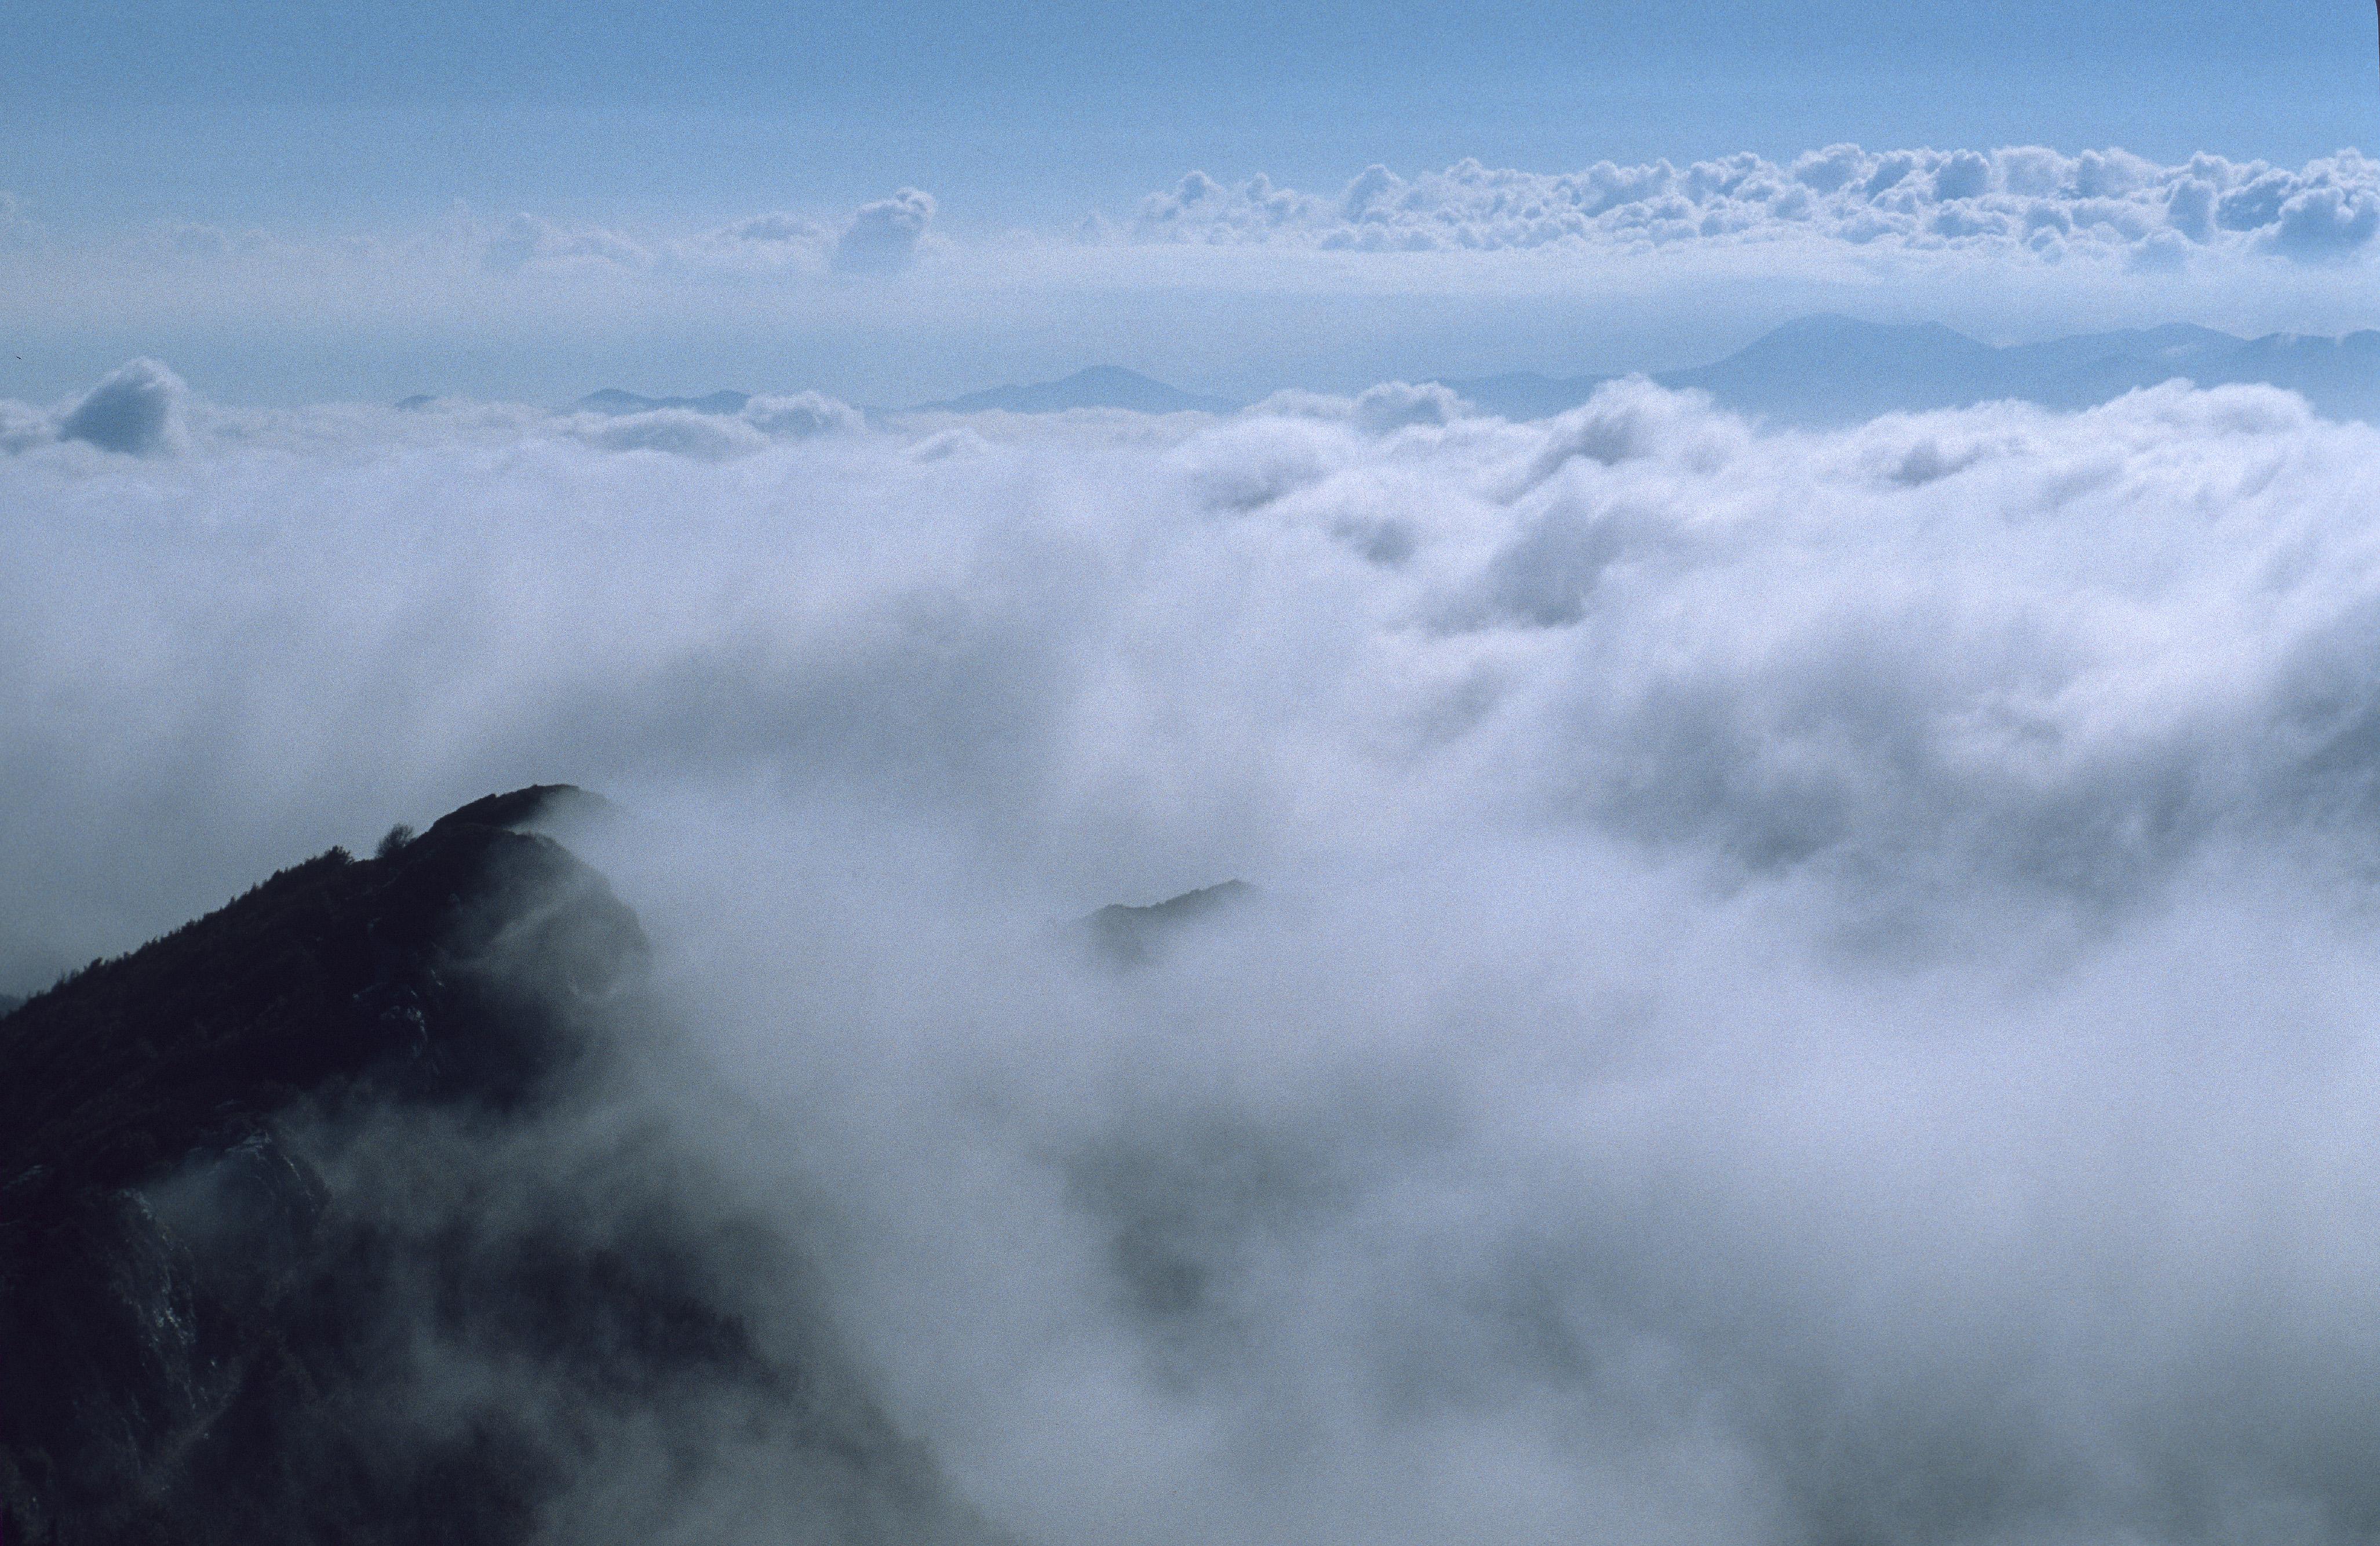 croatia, mountains, hiking, alpinism, summit, Risnjak